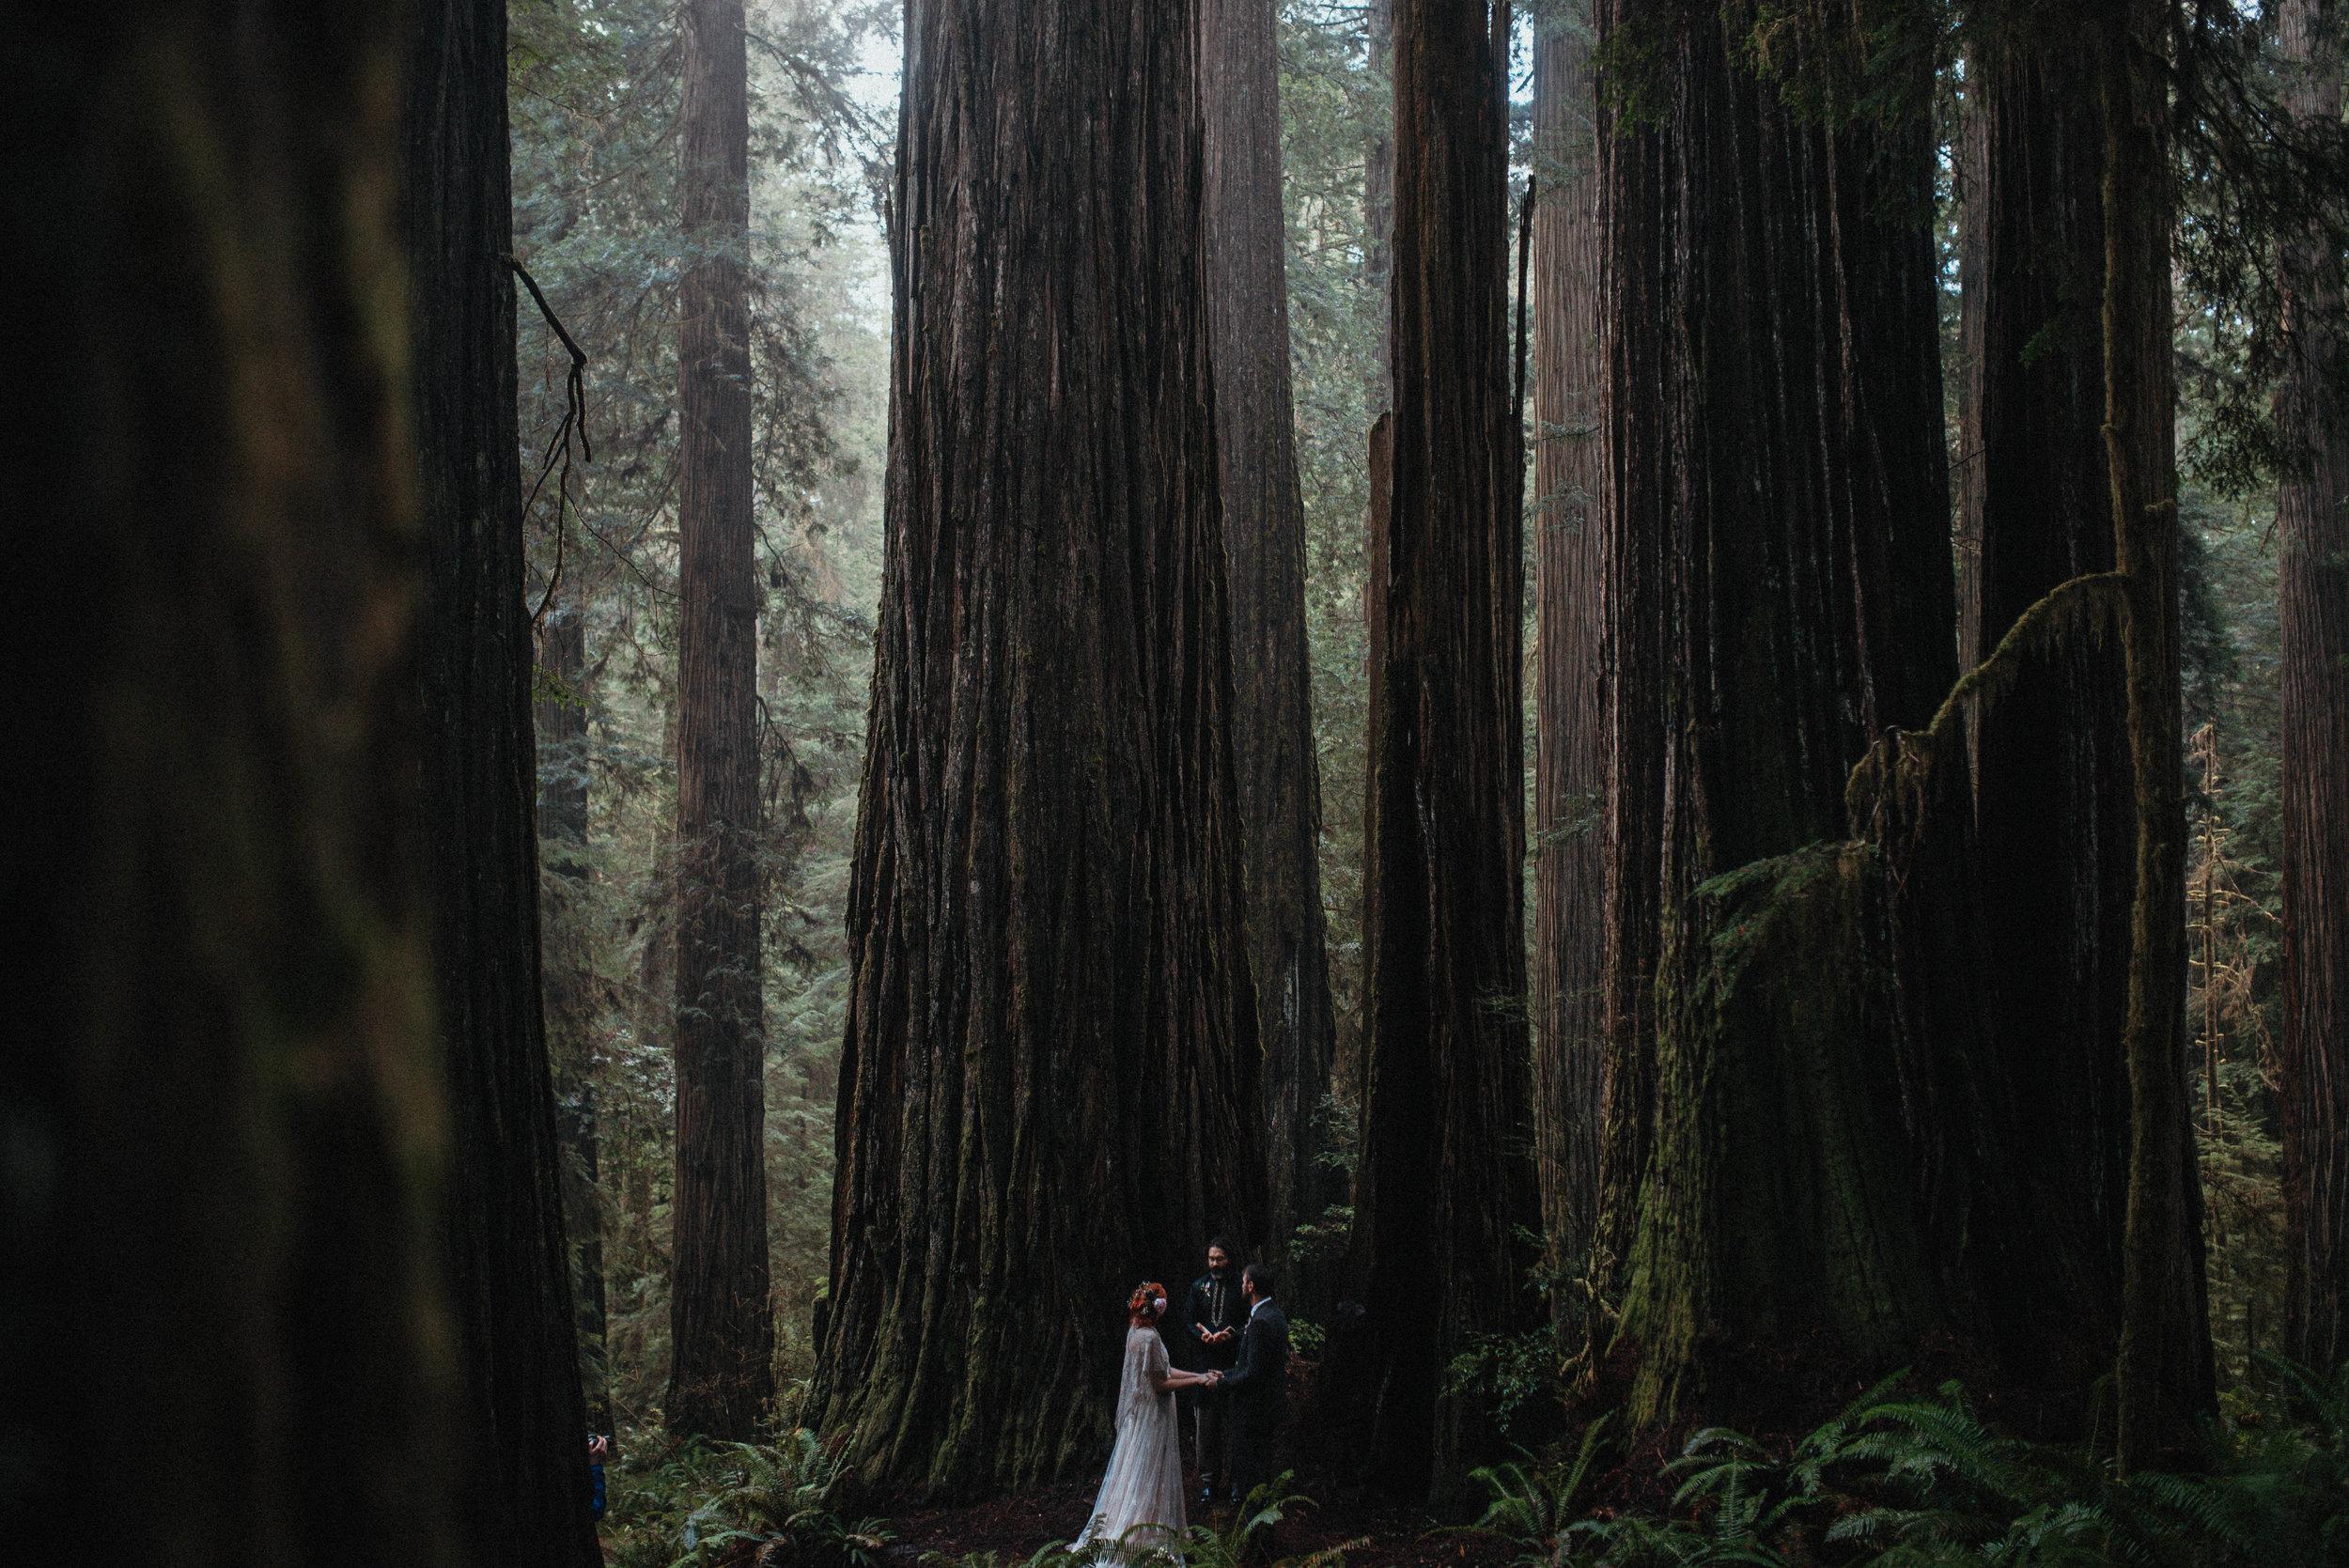 Intimiate Redwoods Elopement , Elopement Inspiration, Jessica Heron Images, Northern California Elopement, Oregon Elopement, Oregon Wedding, Elopement Ideas, Oregon Wedding, Redwoods Ceremony